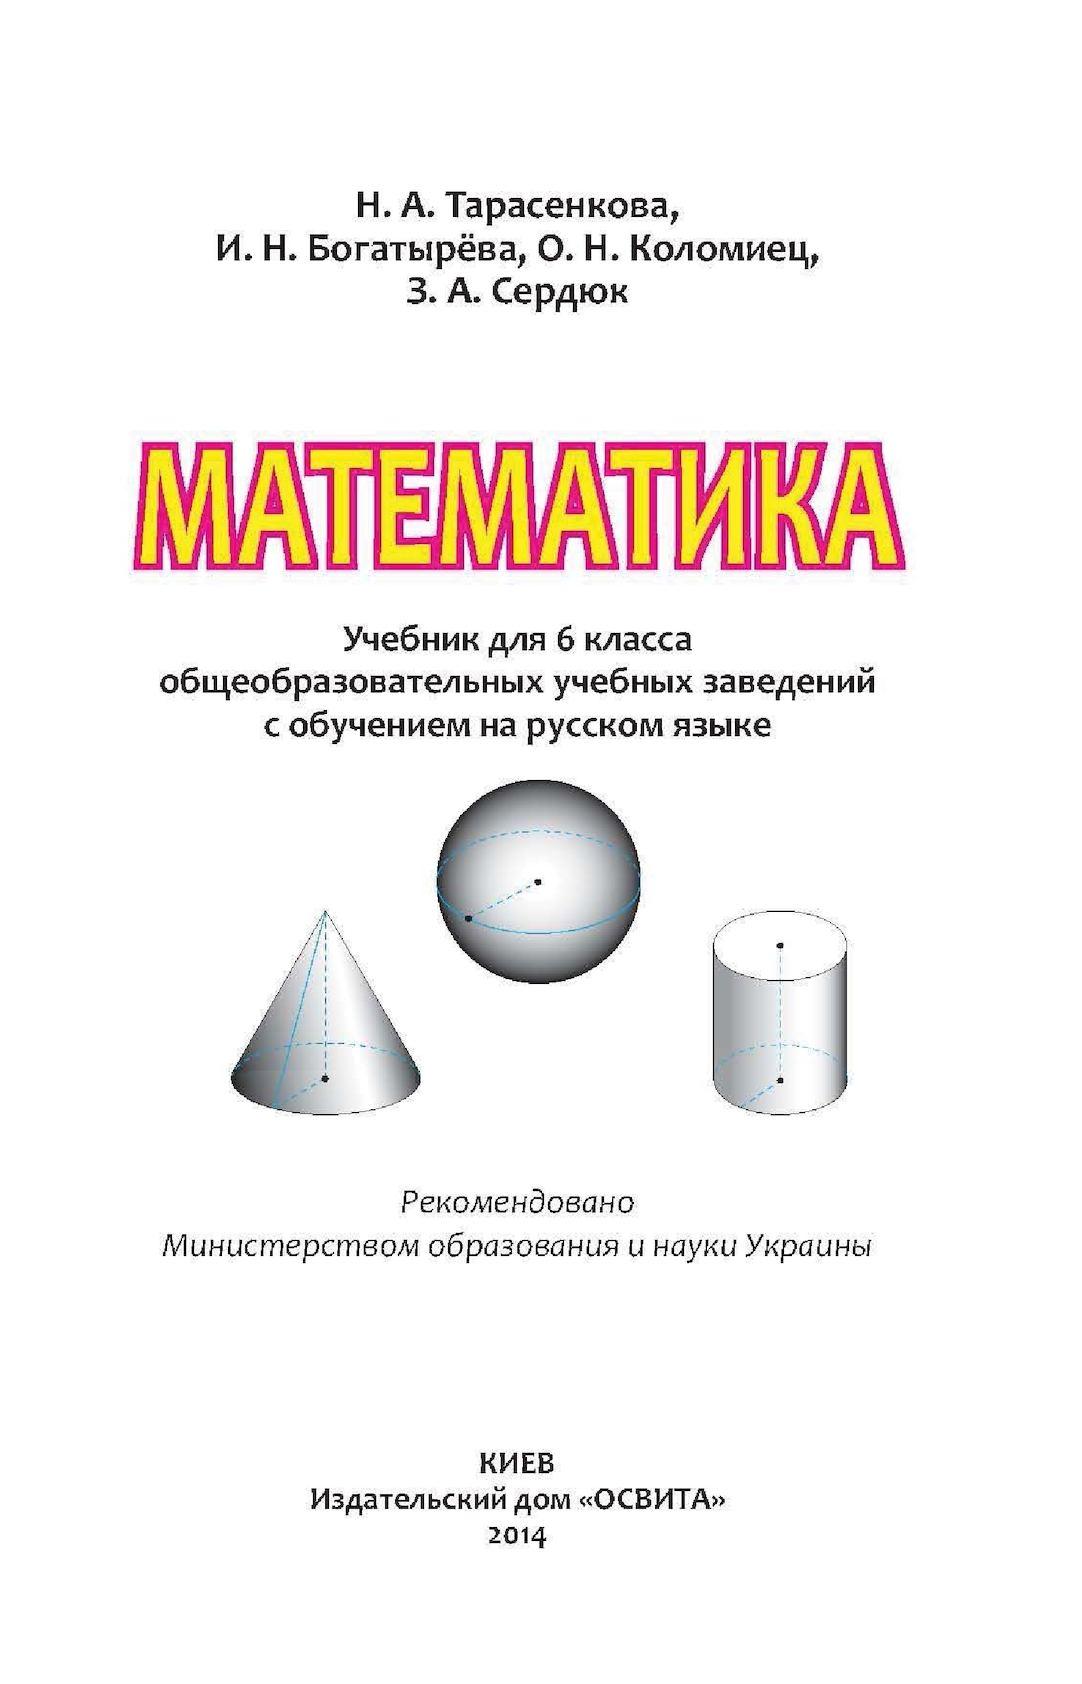 Решебник 5 Класс Математике Тарасенкова Богатырева Коломиец